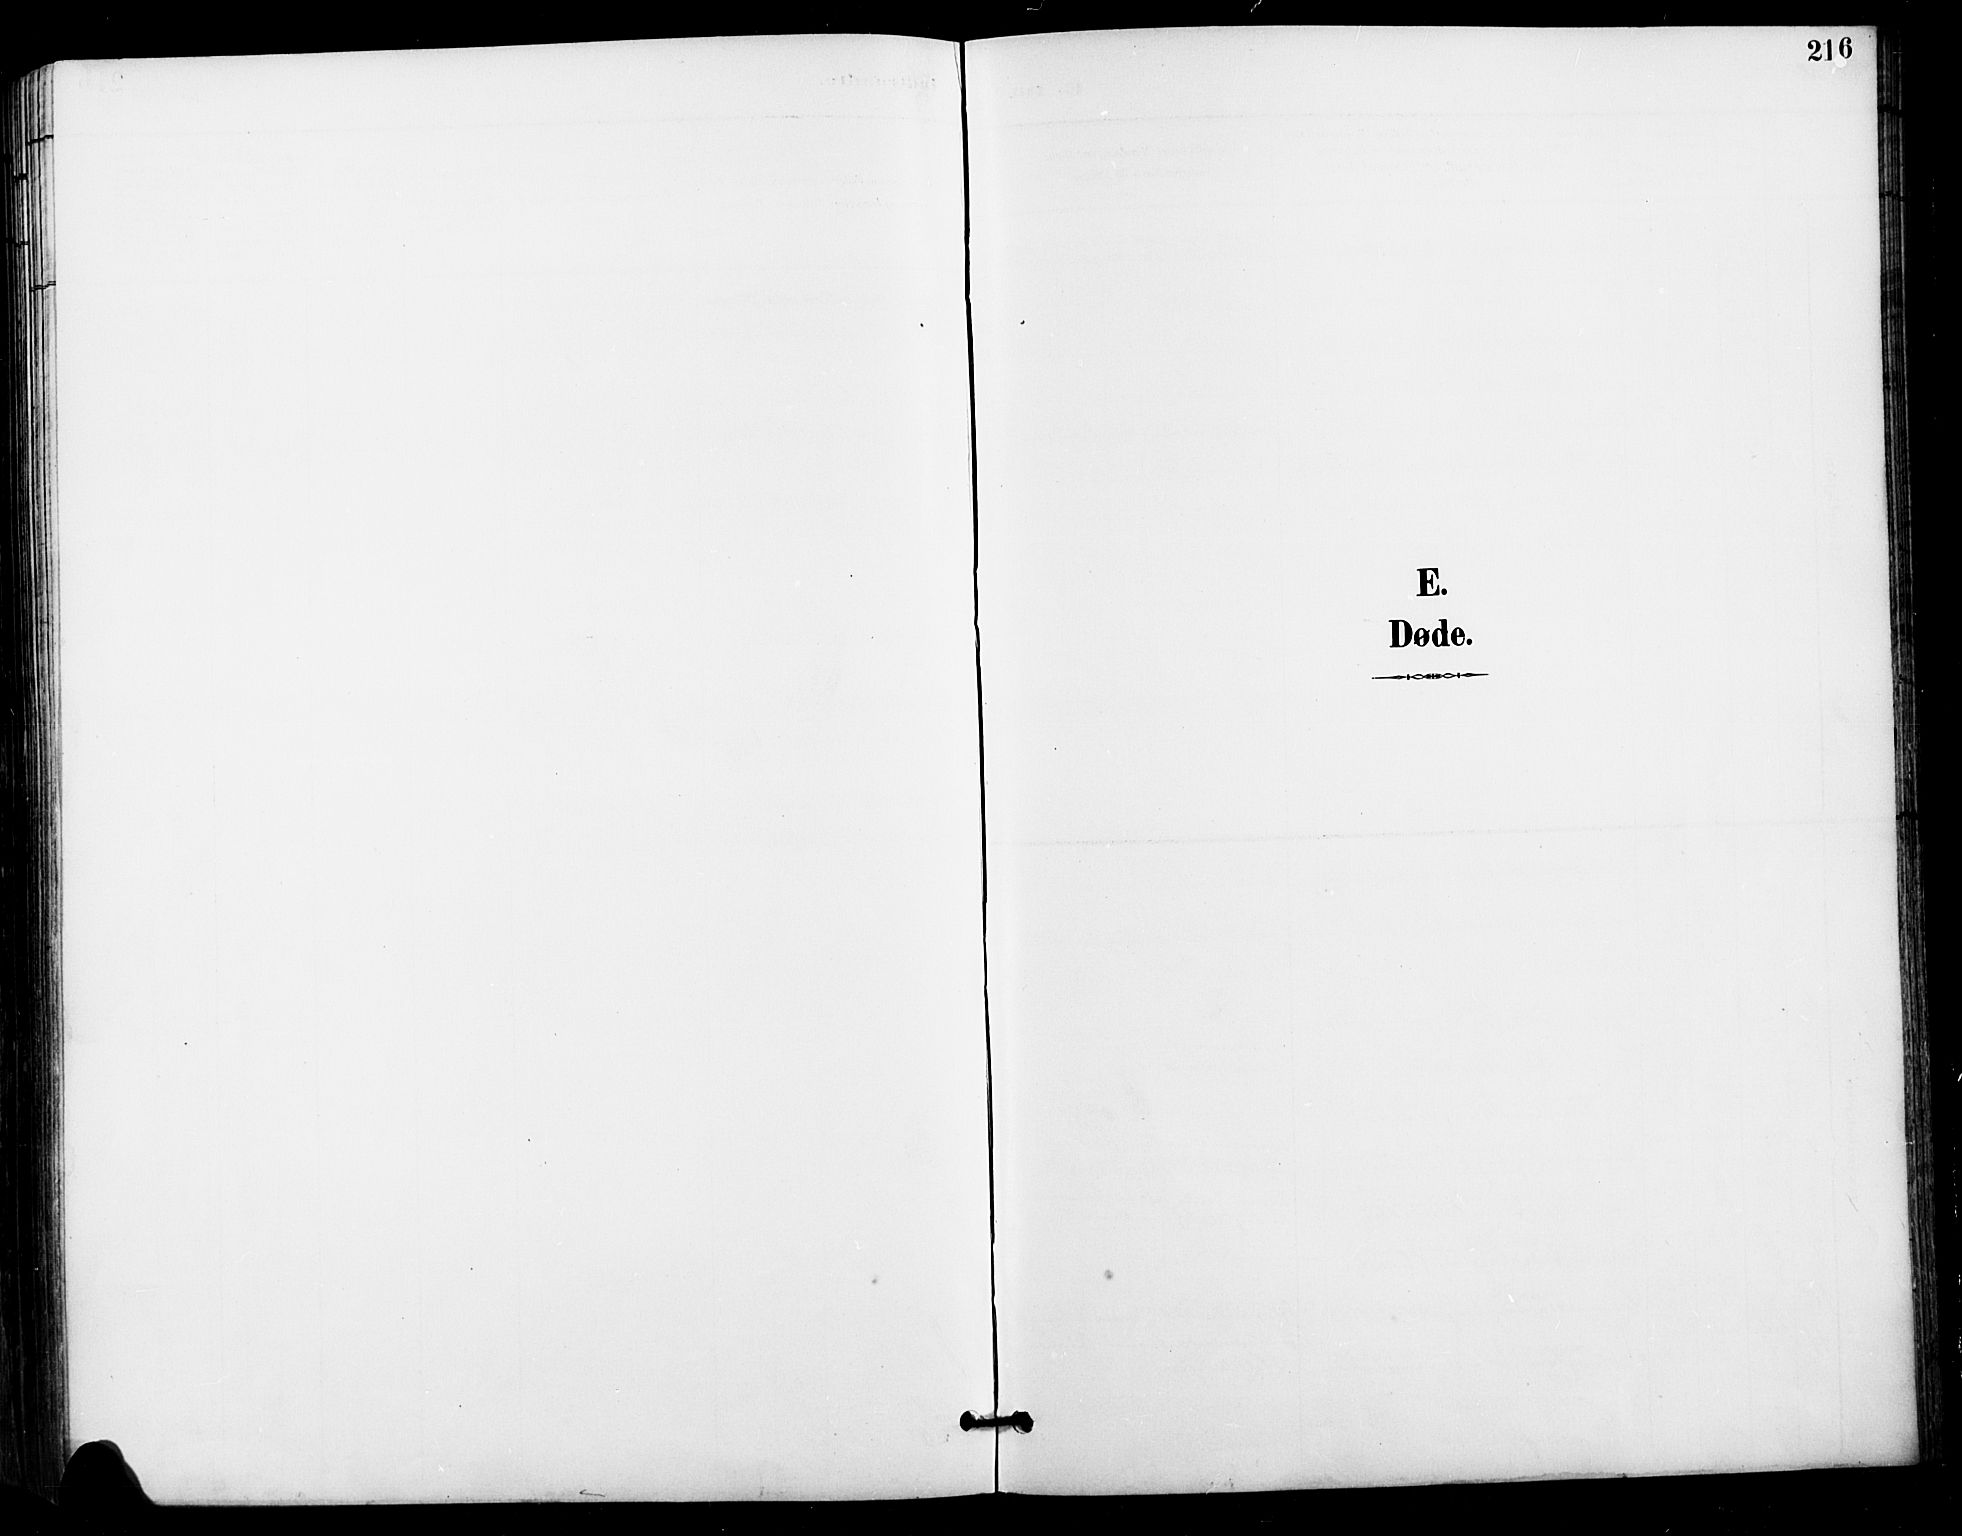 SAH, Vestre Gausdal prestekontor, Parish register (copy) no. 3, 1896-1925, p. 216